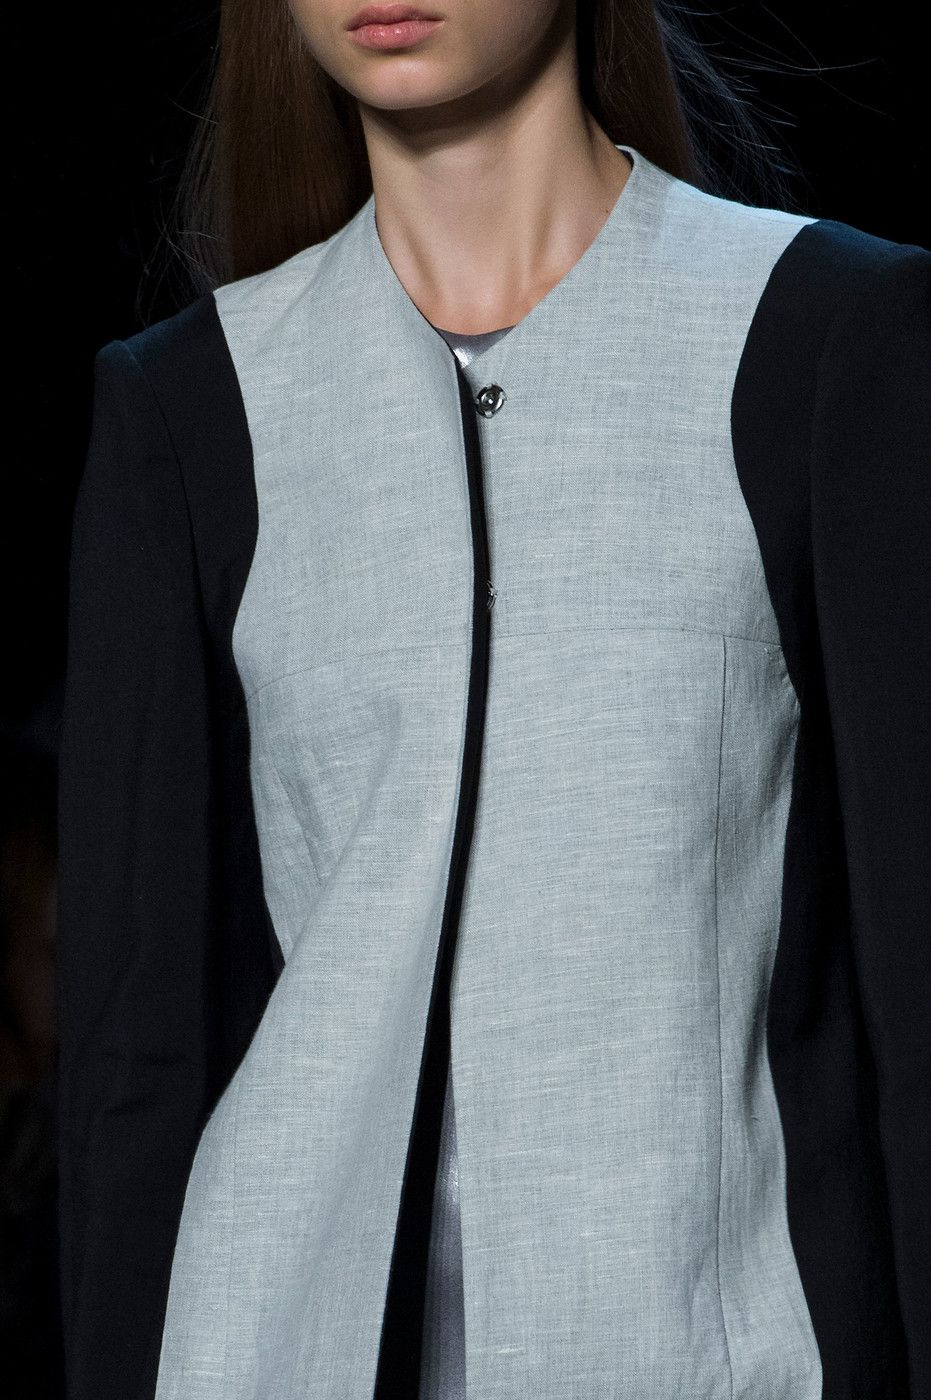 Narciso Rodriguez at New York Spring 2017 (Details)